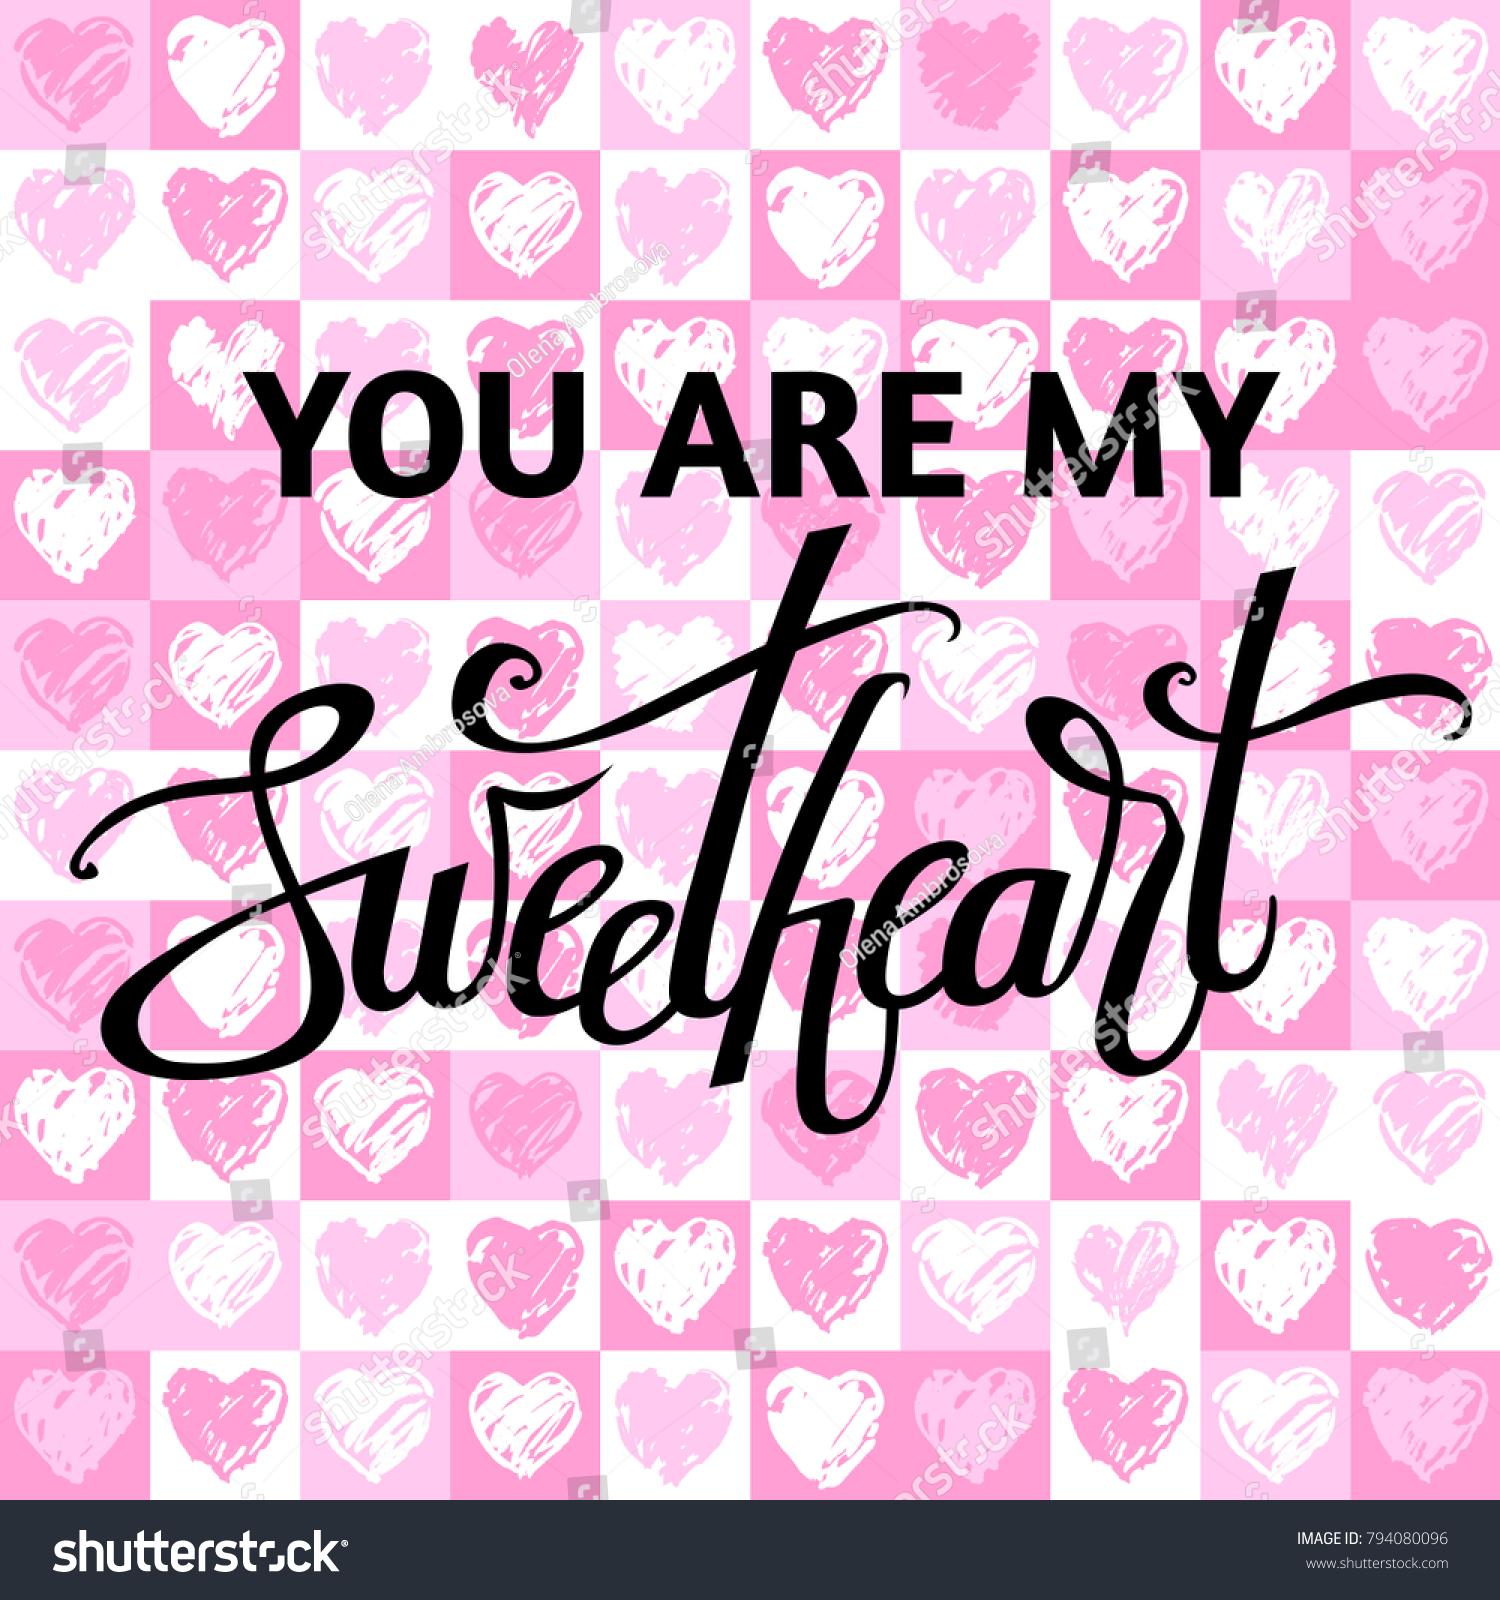 Vector Image Valentines Day Sweetheart Lettering Stock-Vektorgrafik ...